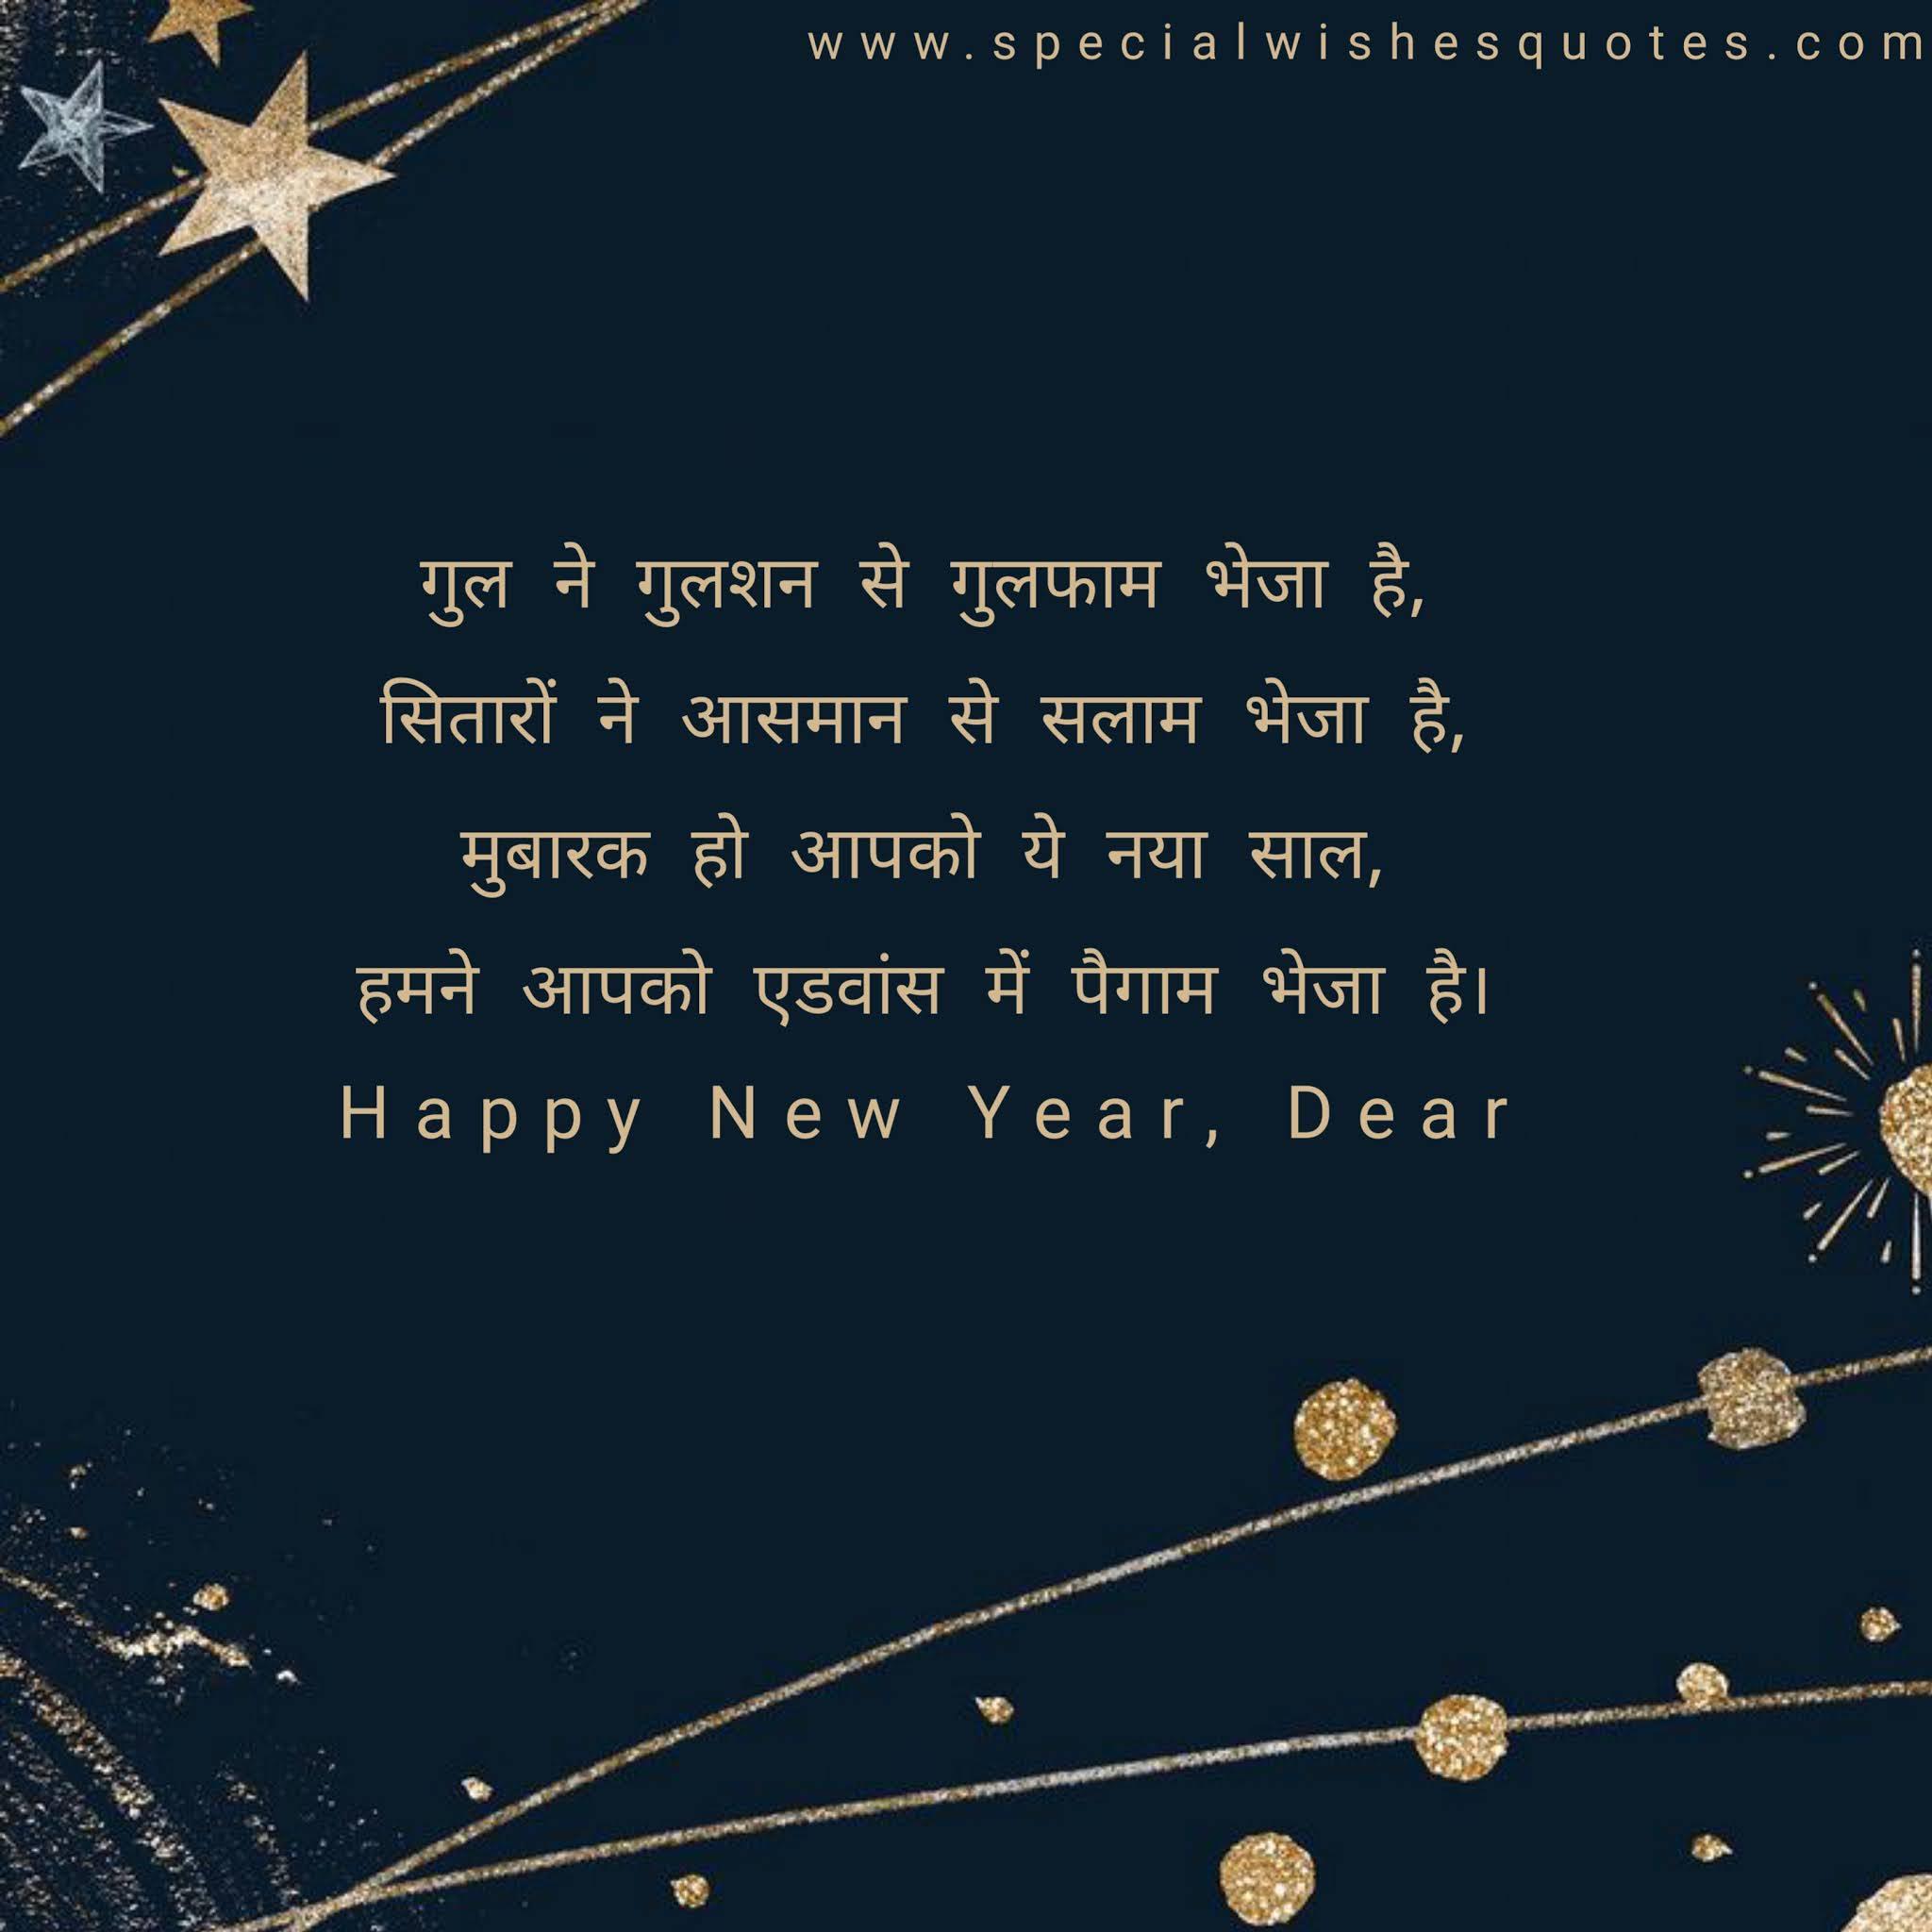 नए साल की शुभकामना सन्देश